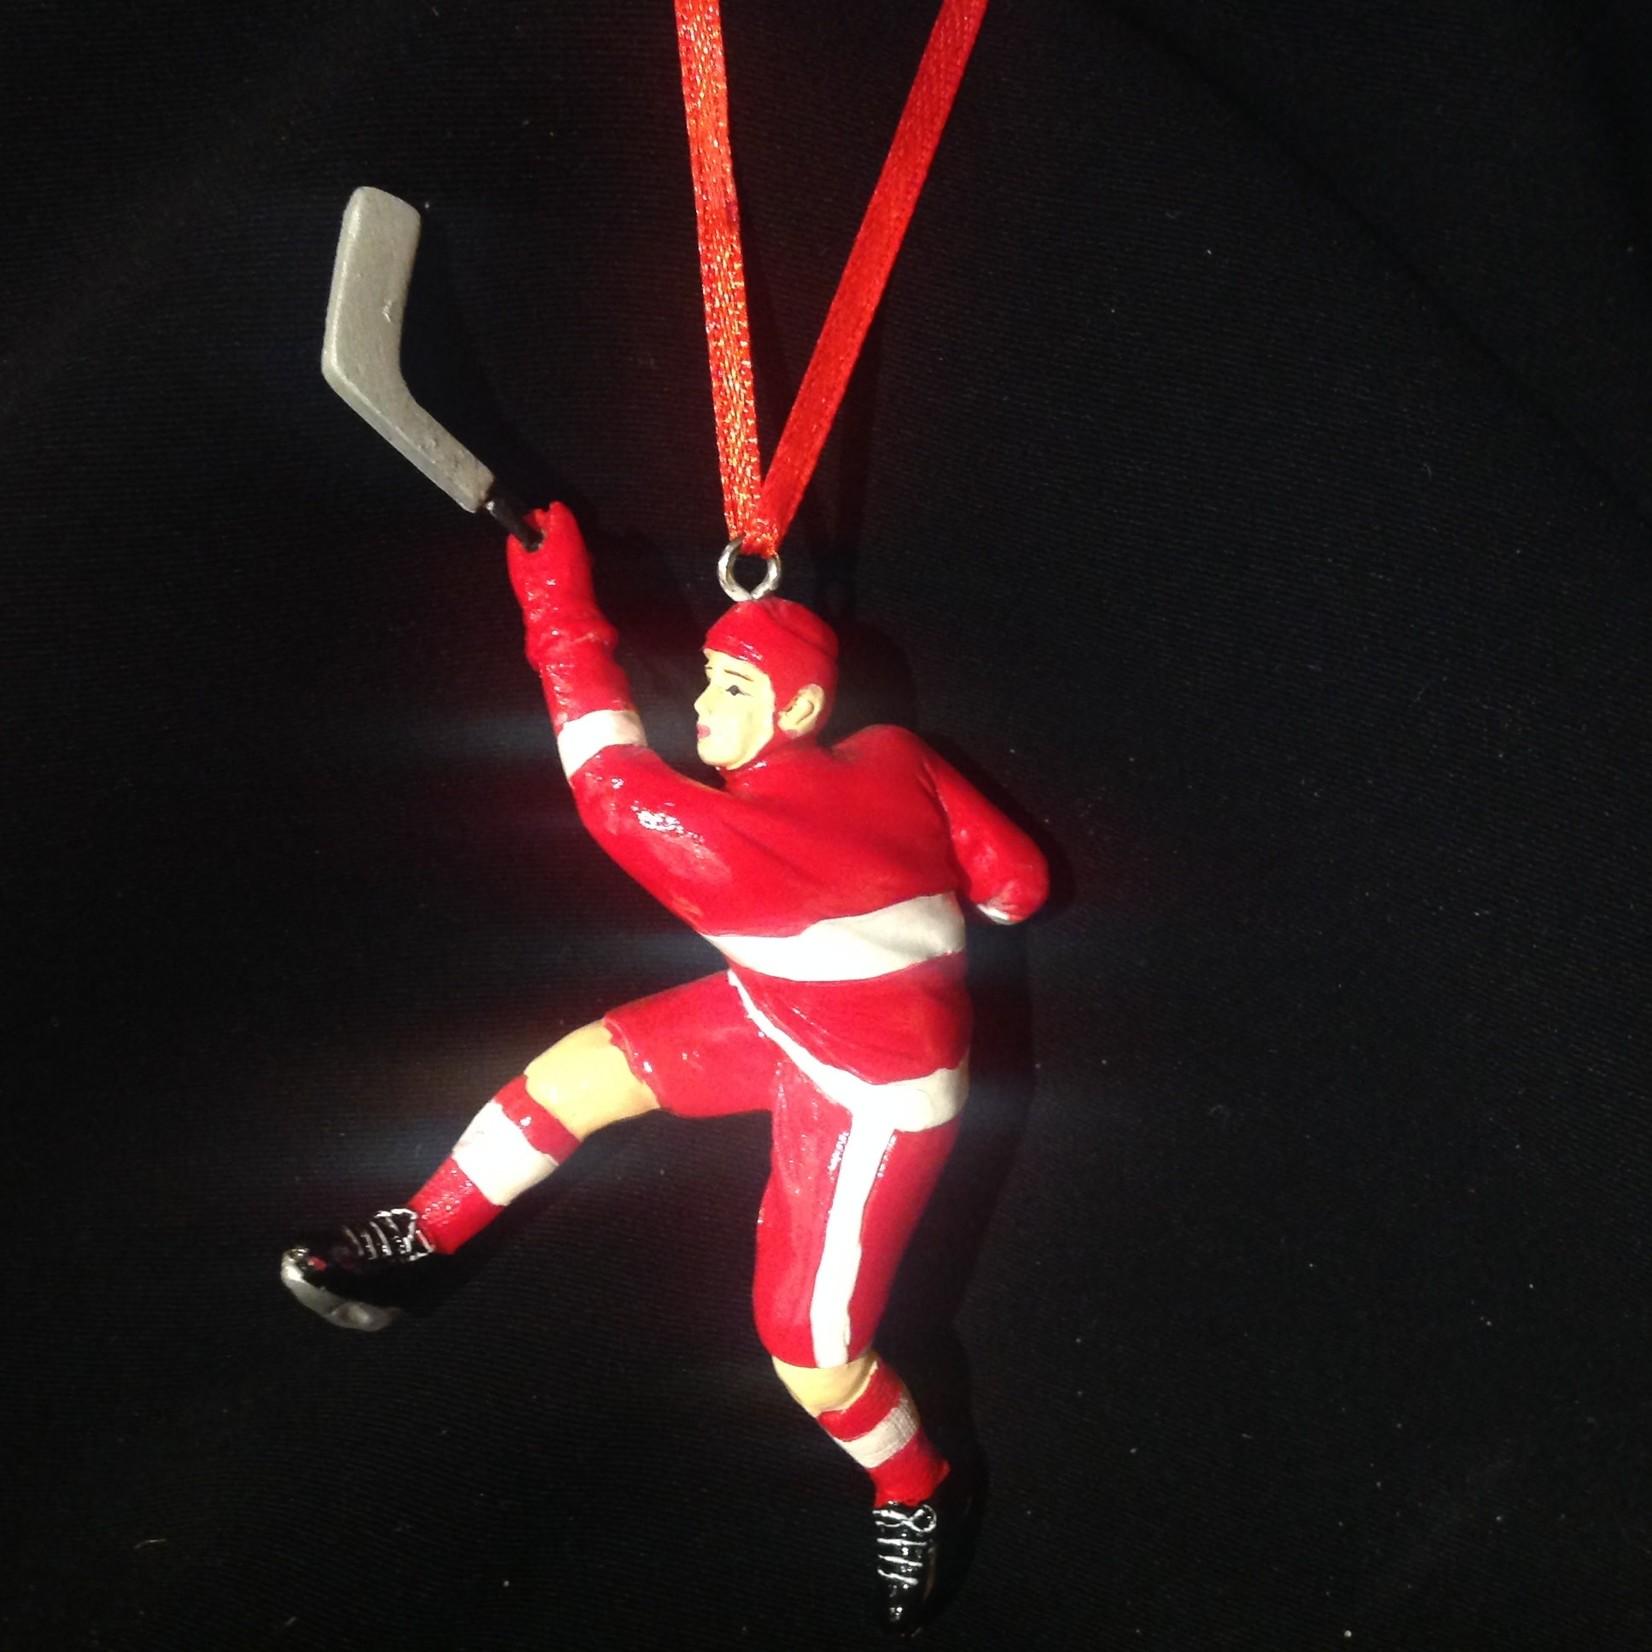 Shooting Hockey Player Orn